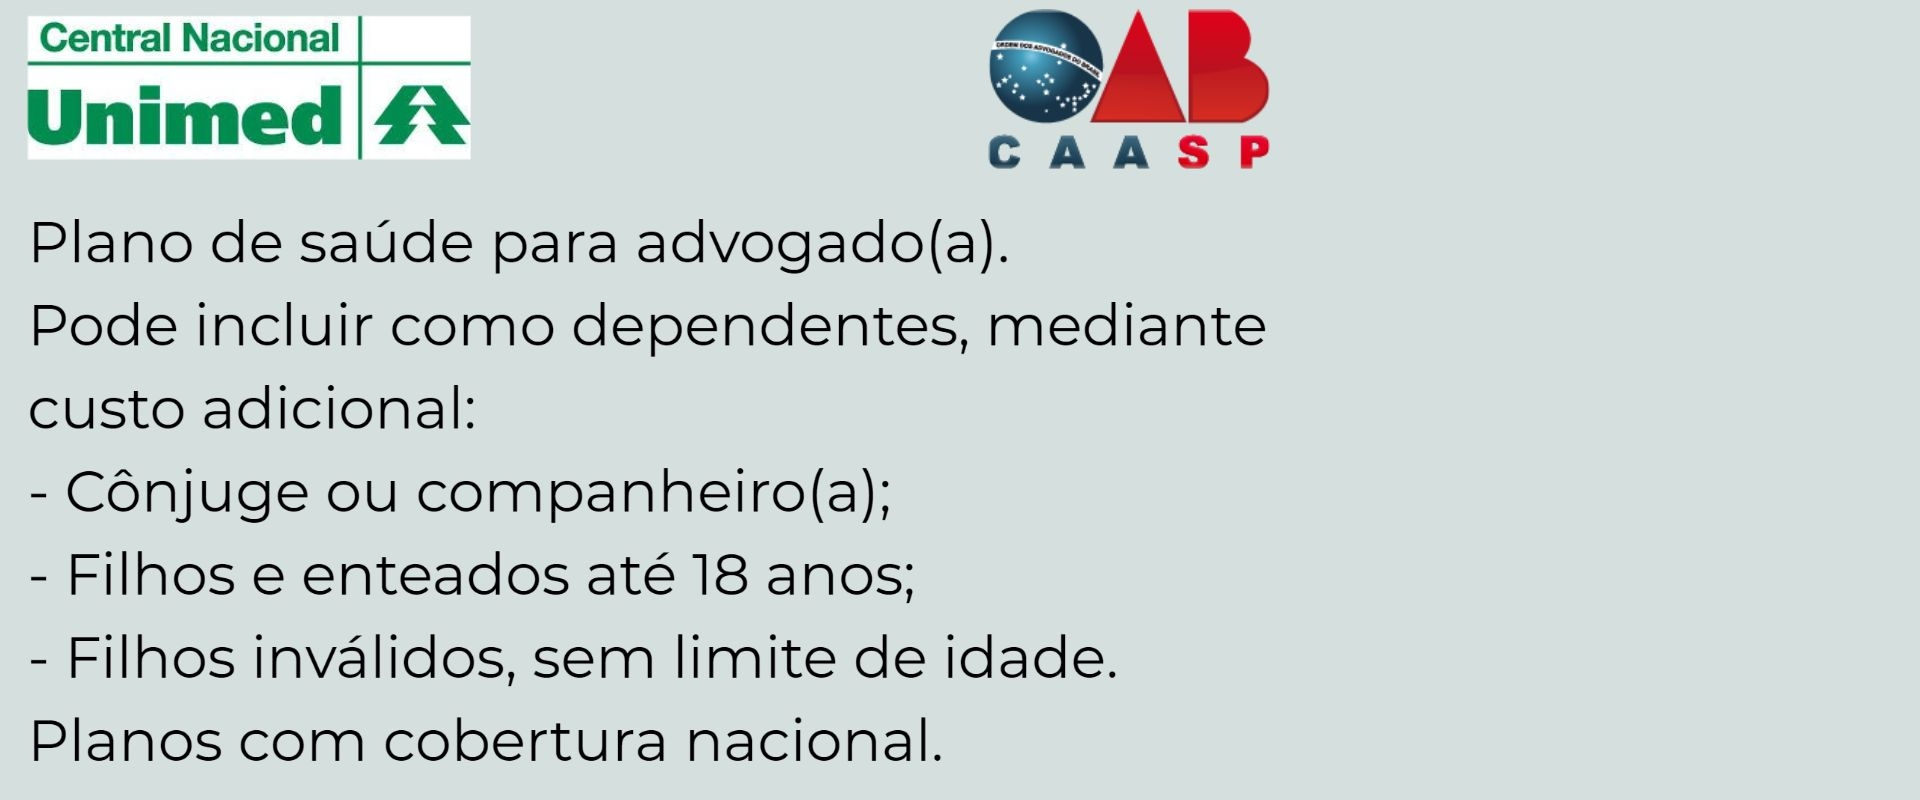 Unimed CAASP Franca